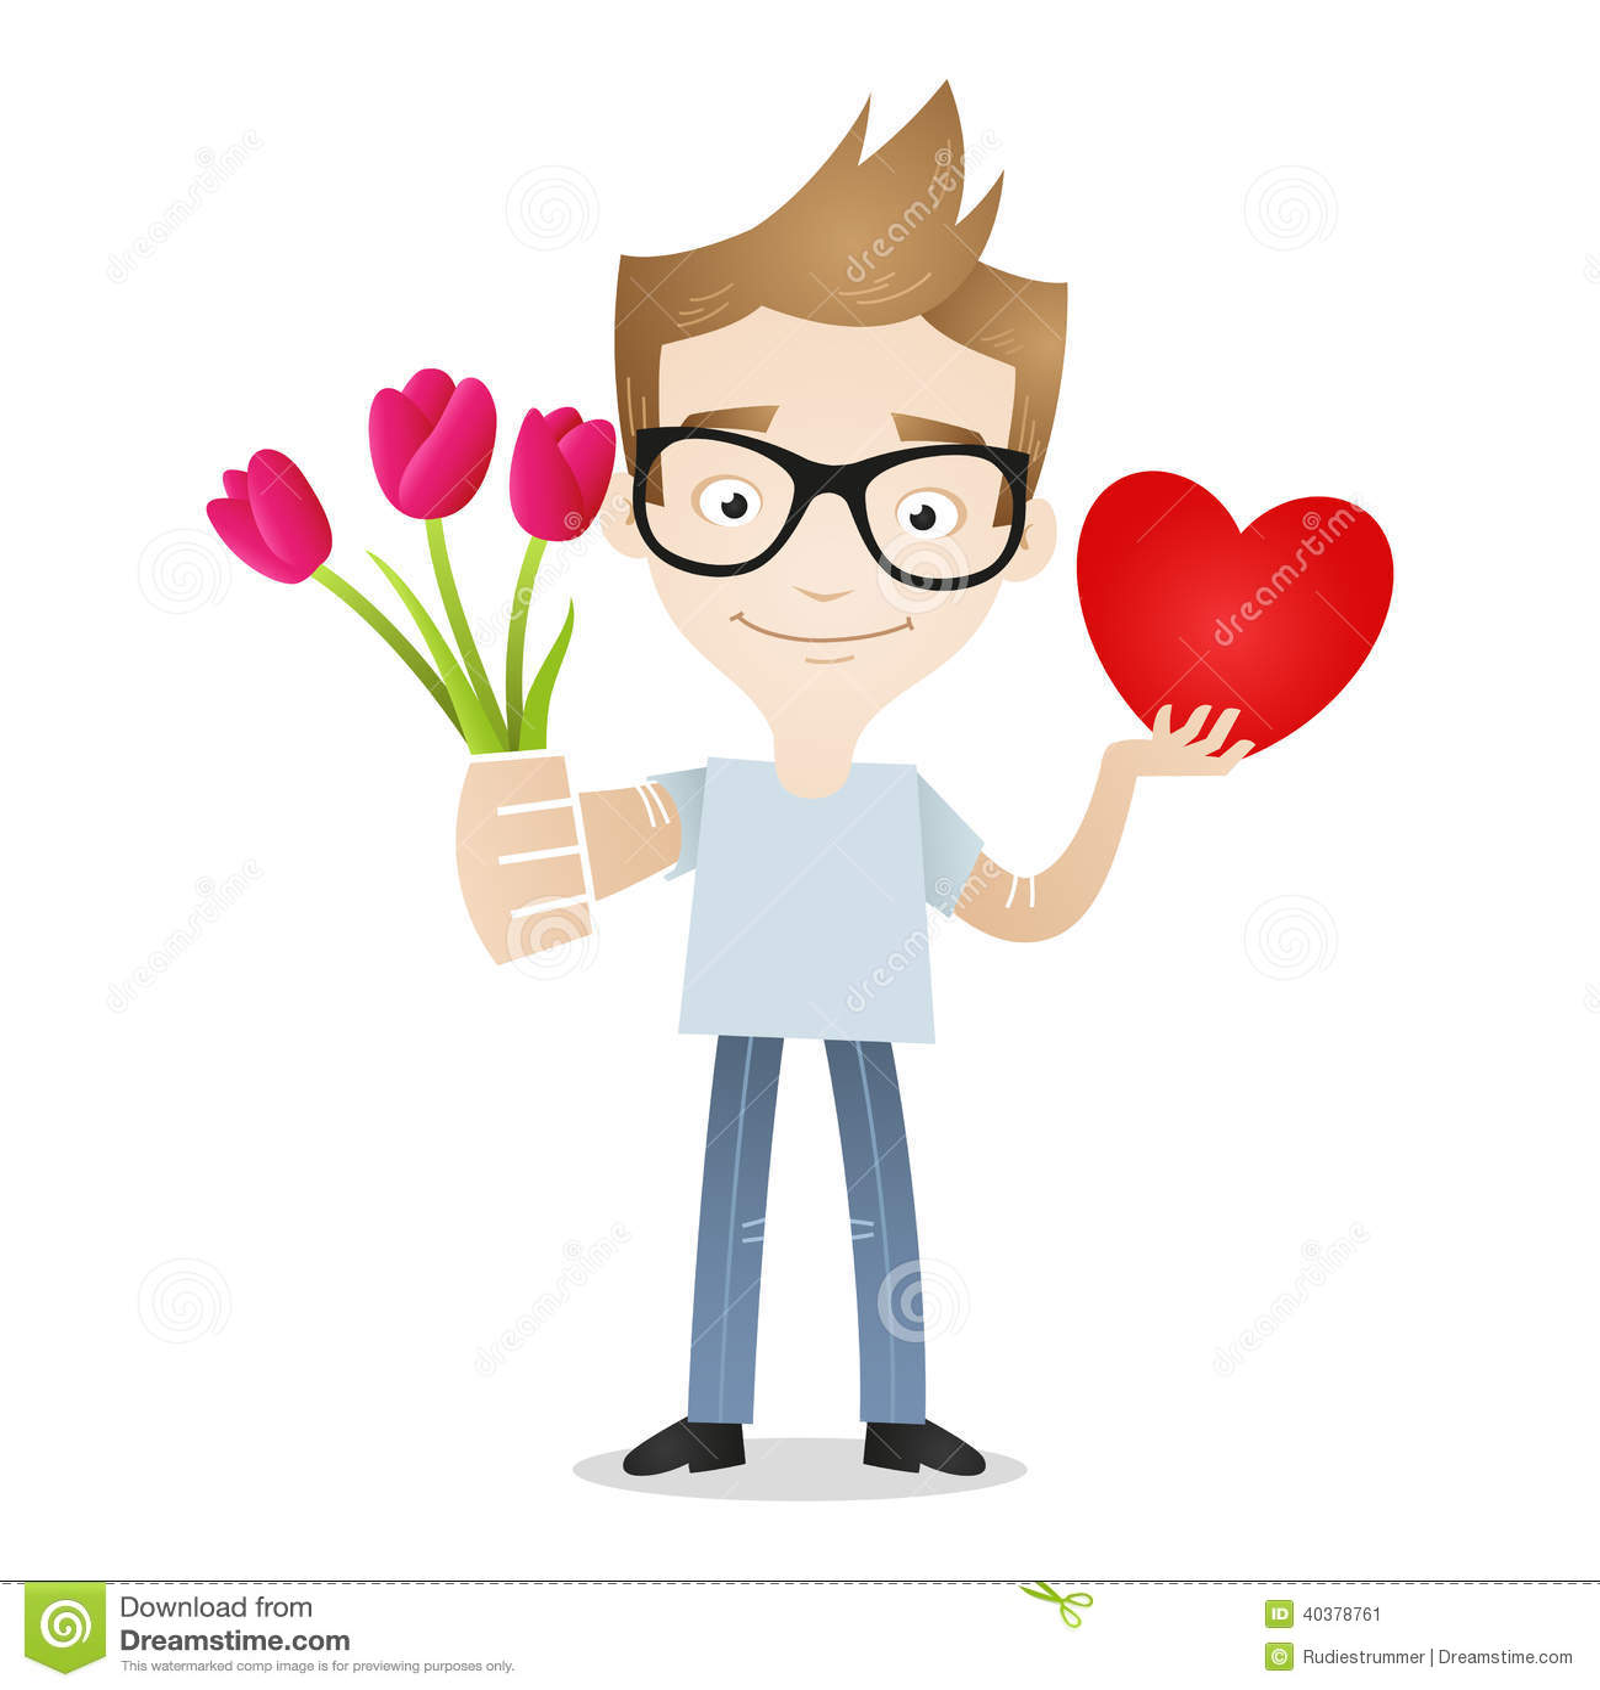 Cartoon Characters Love : Man flowers heart love gift stock vector image